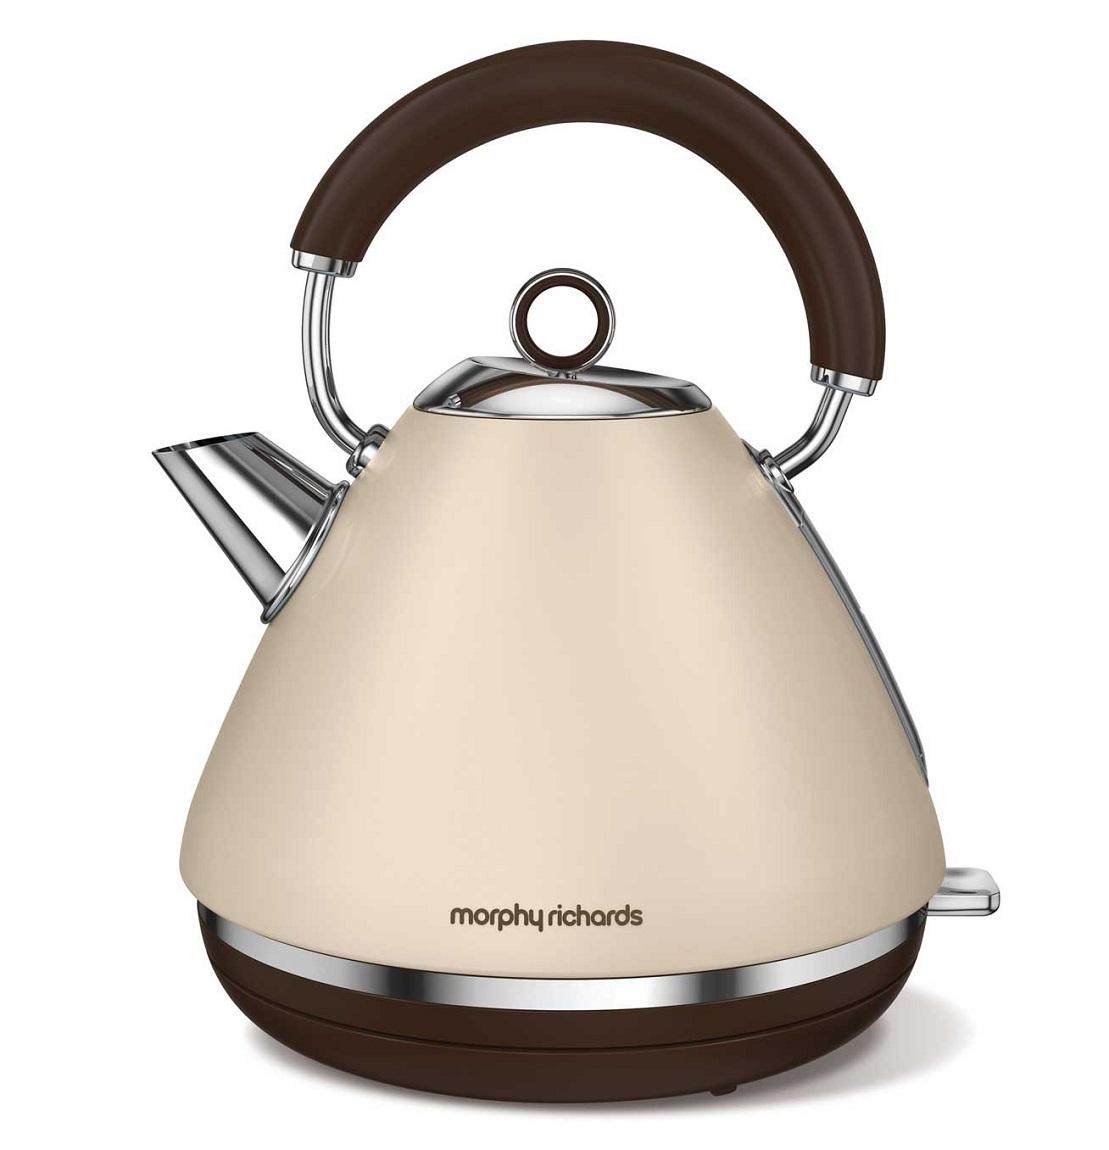 Morphy Richards Kettle: Morphy Richards 102101 Accents Special Edition Kettle 1.5 Litre Rapid Boil Sand